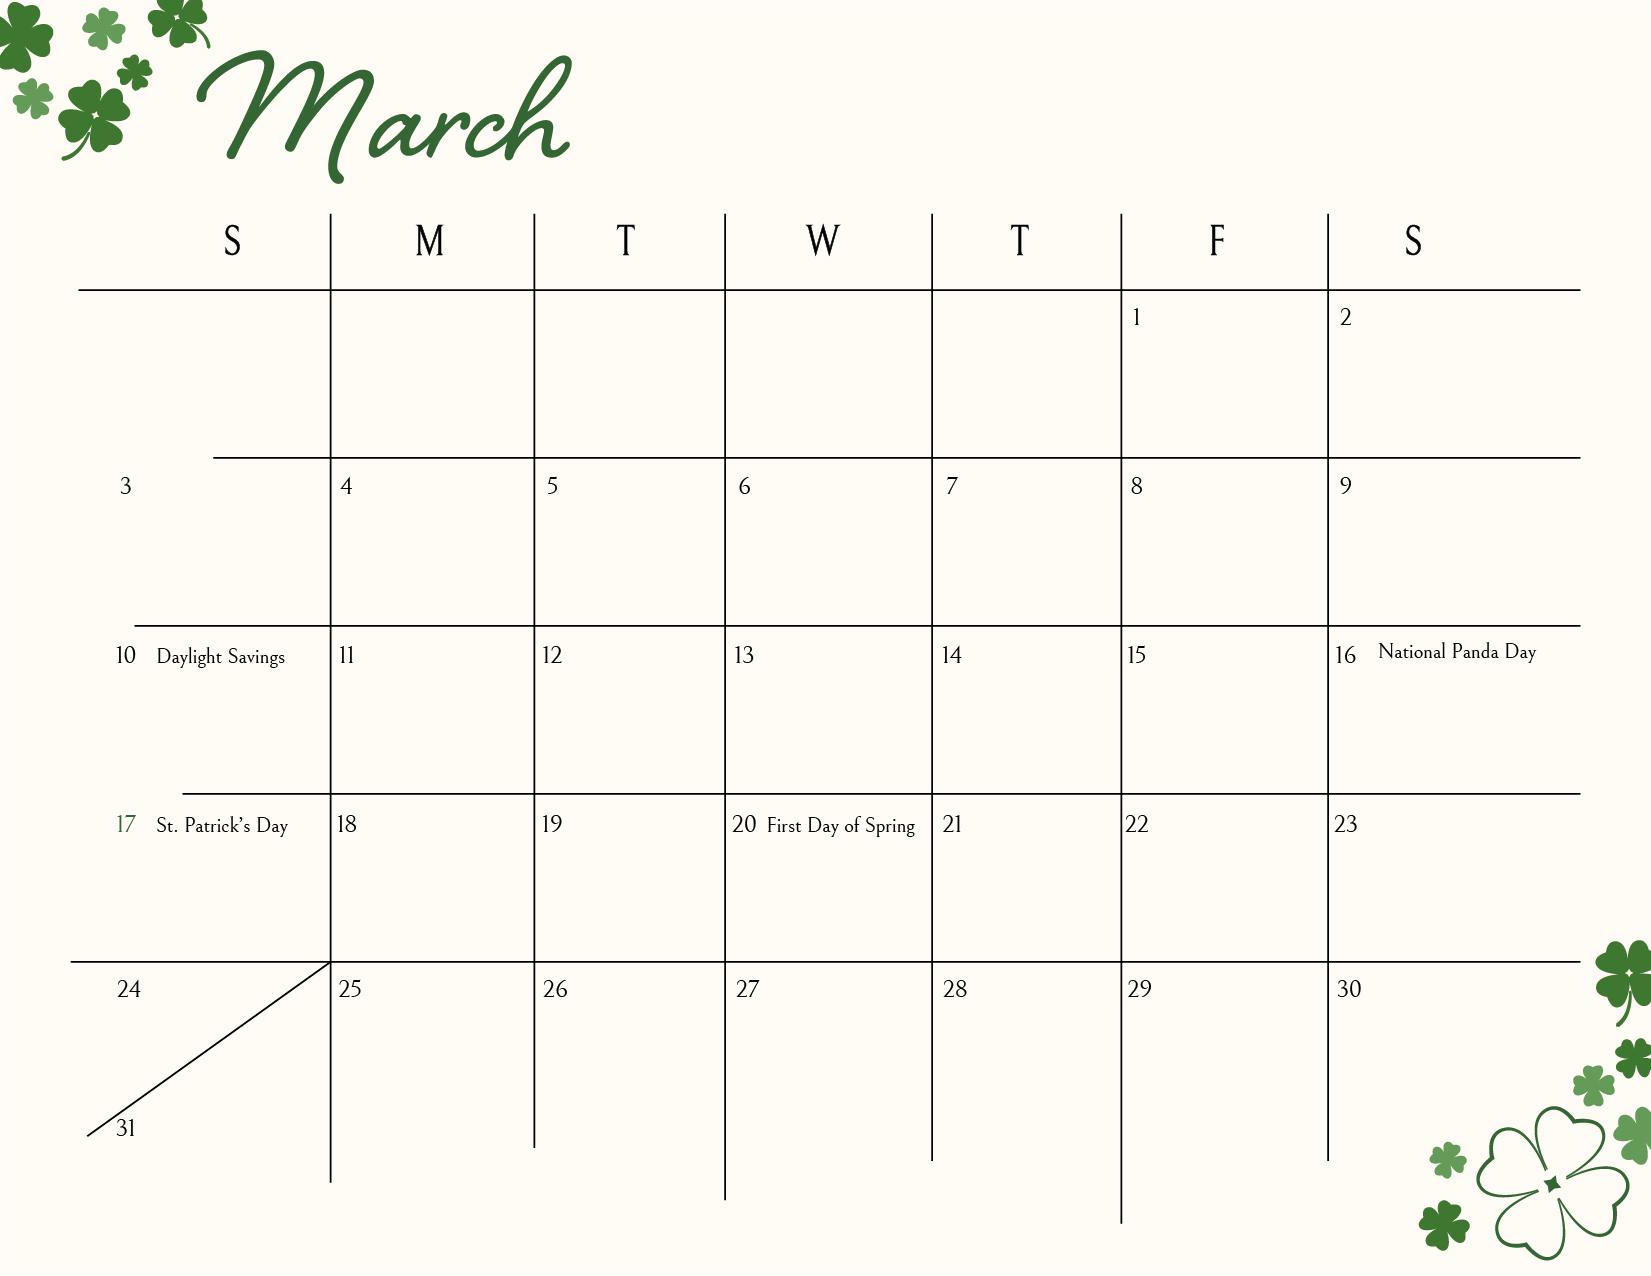 March download freebie calendar